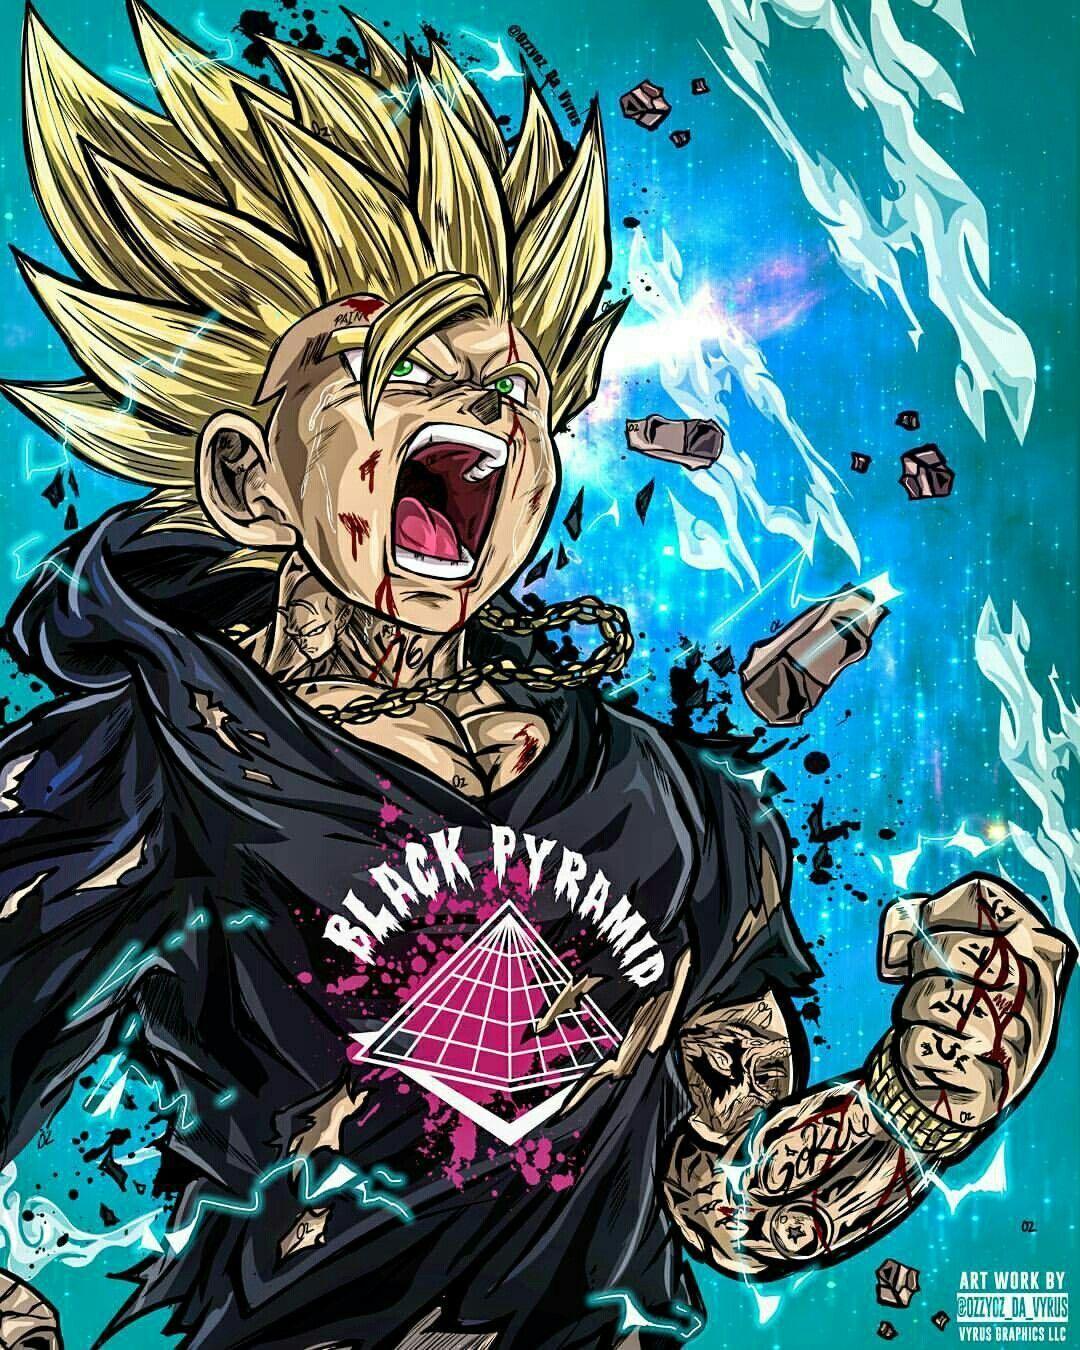 Best Anime Backgrounds Wallpaper Engine : anime, backgrounds, wallpaper, engine, Anime, Cartoon, Wallpapers, WallpaperDog